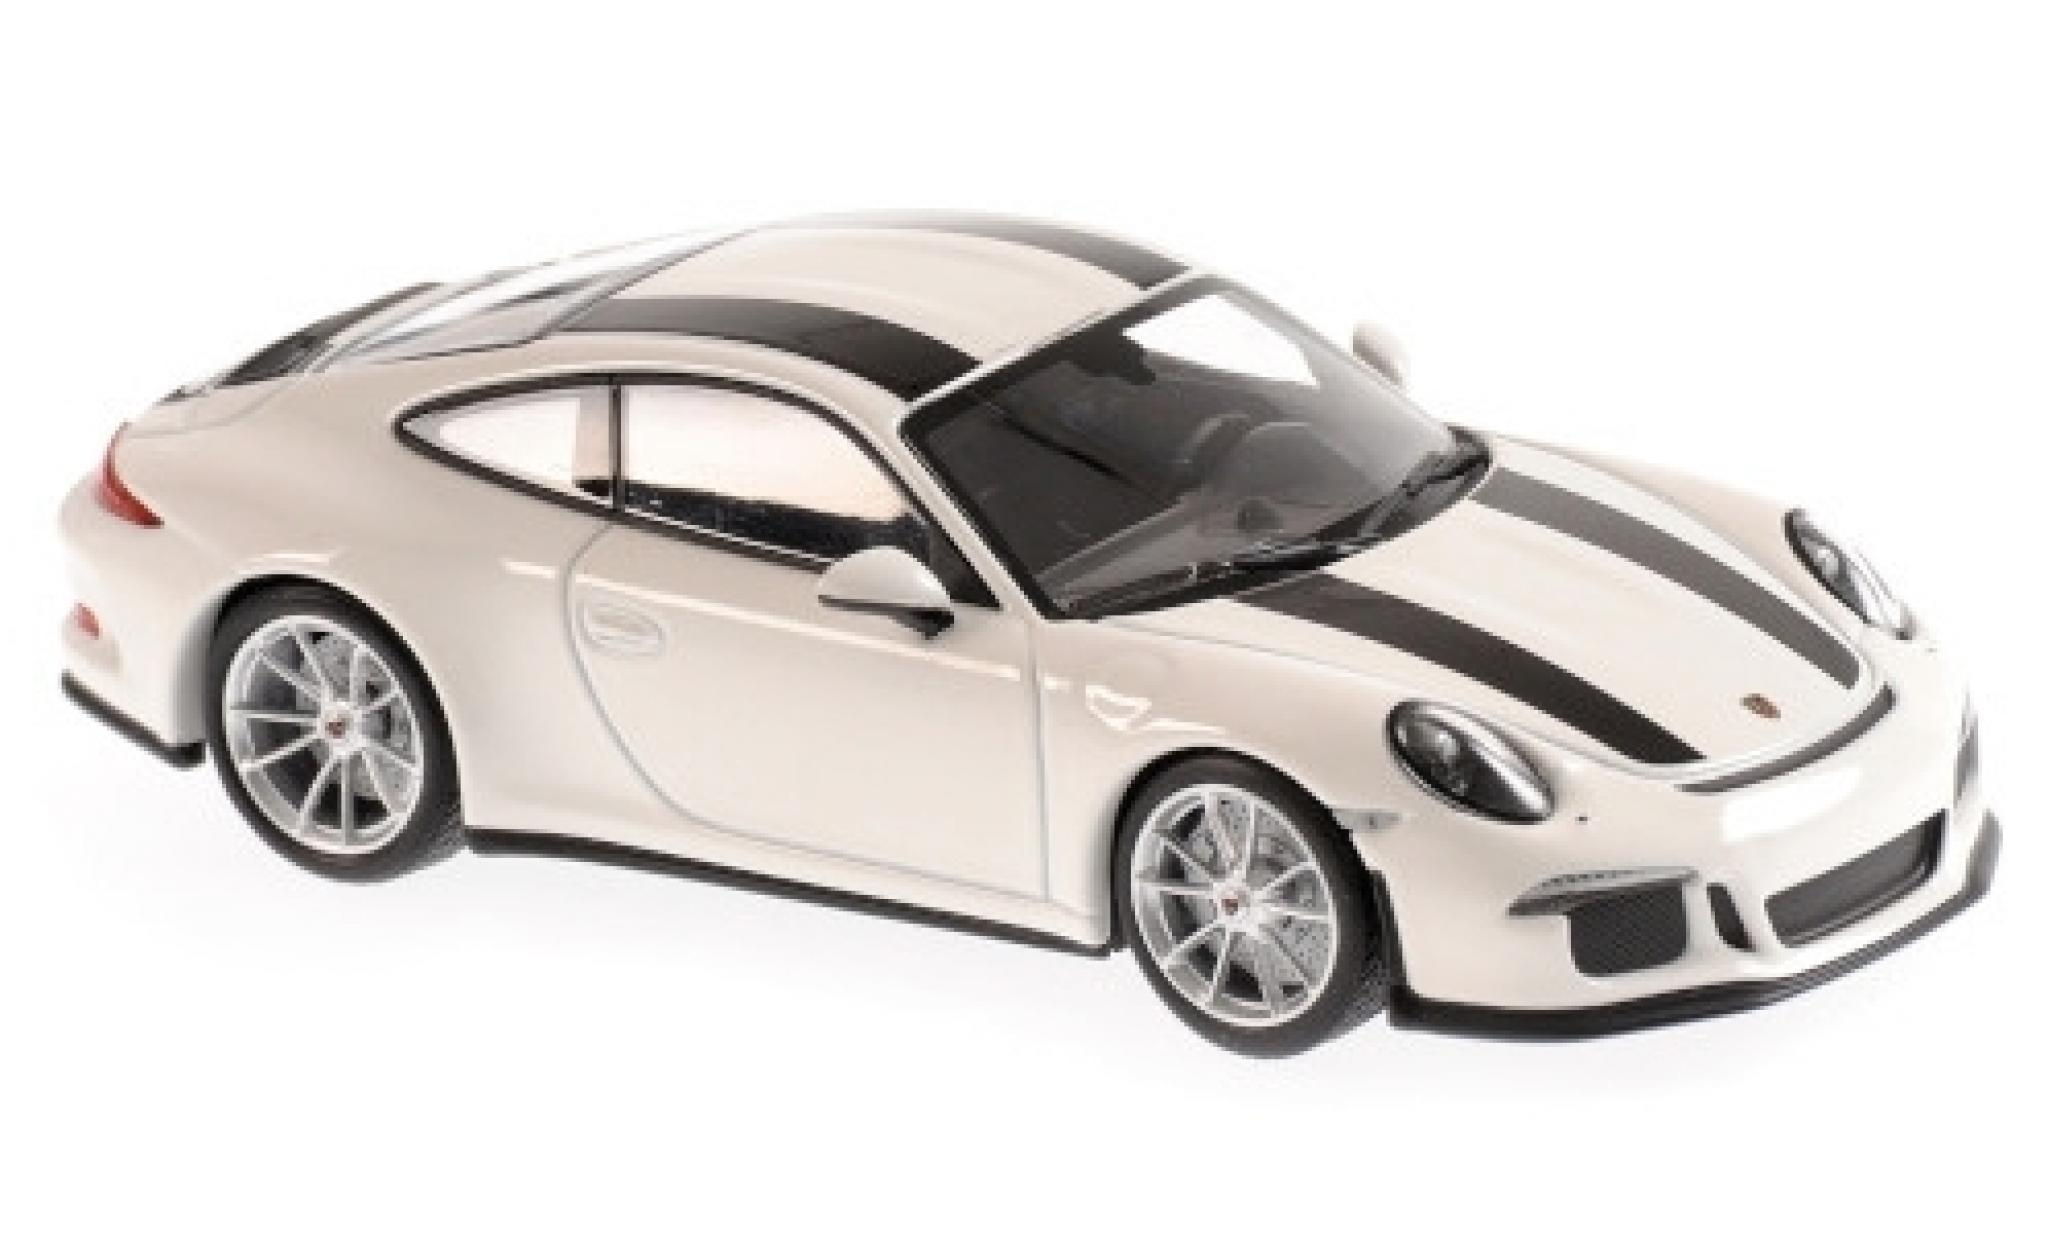 Porsche 991 R 1/43 Maxichamps 911  white/black 2016